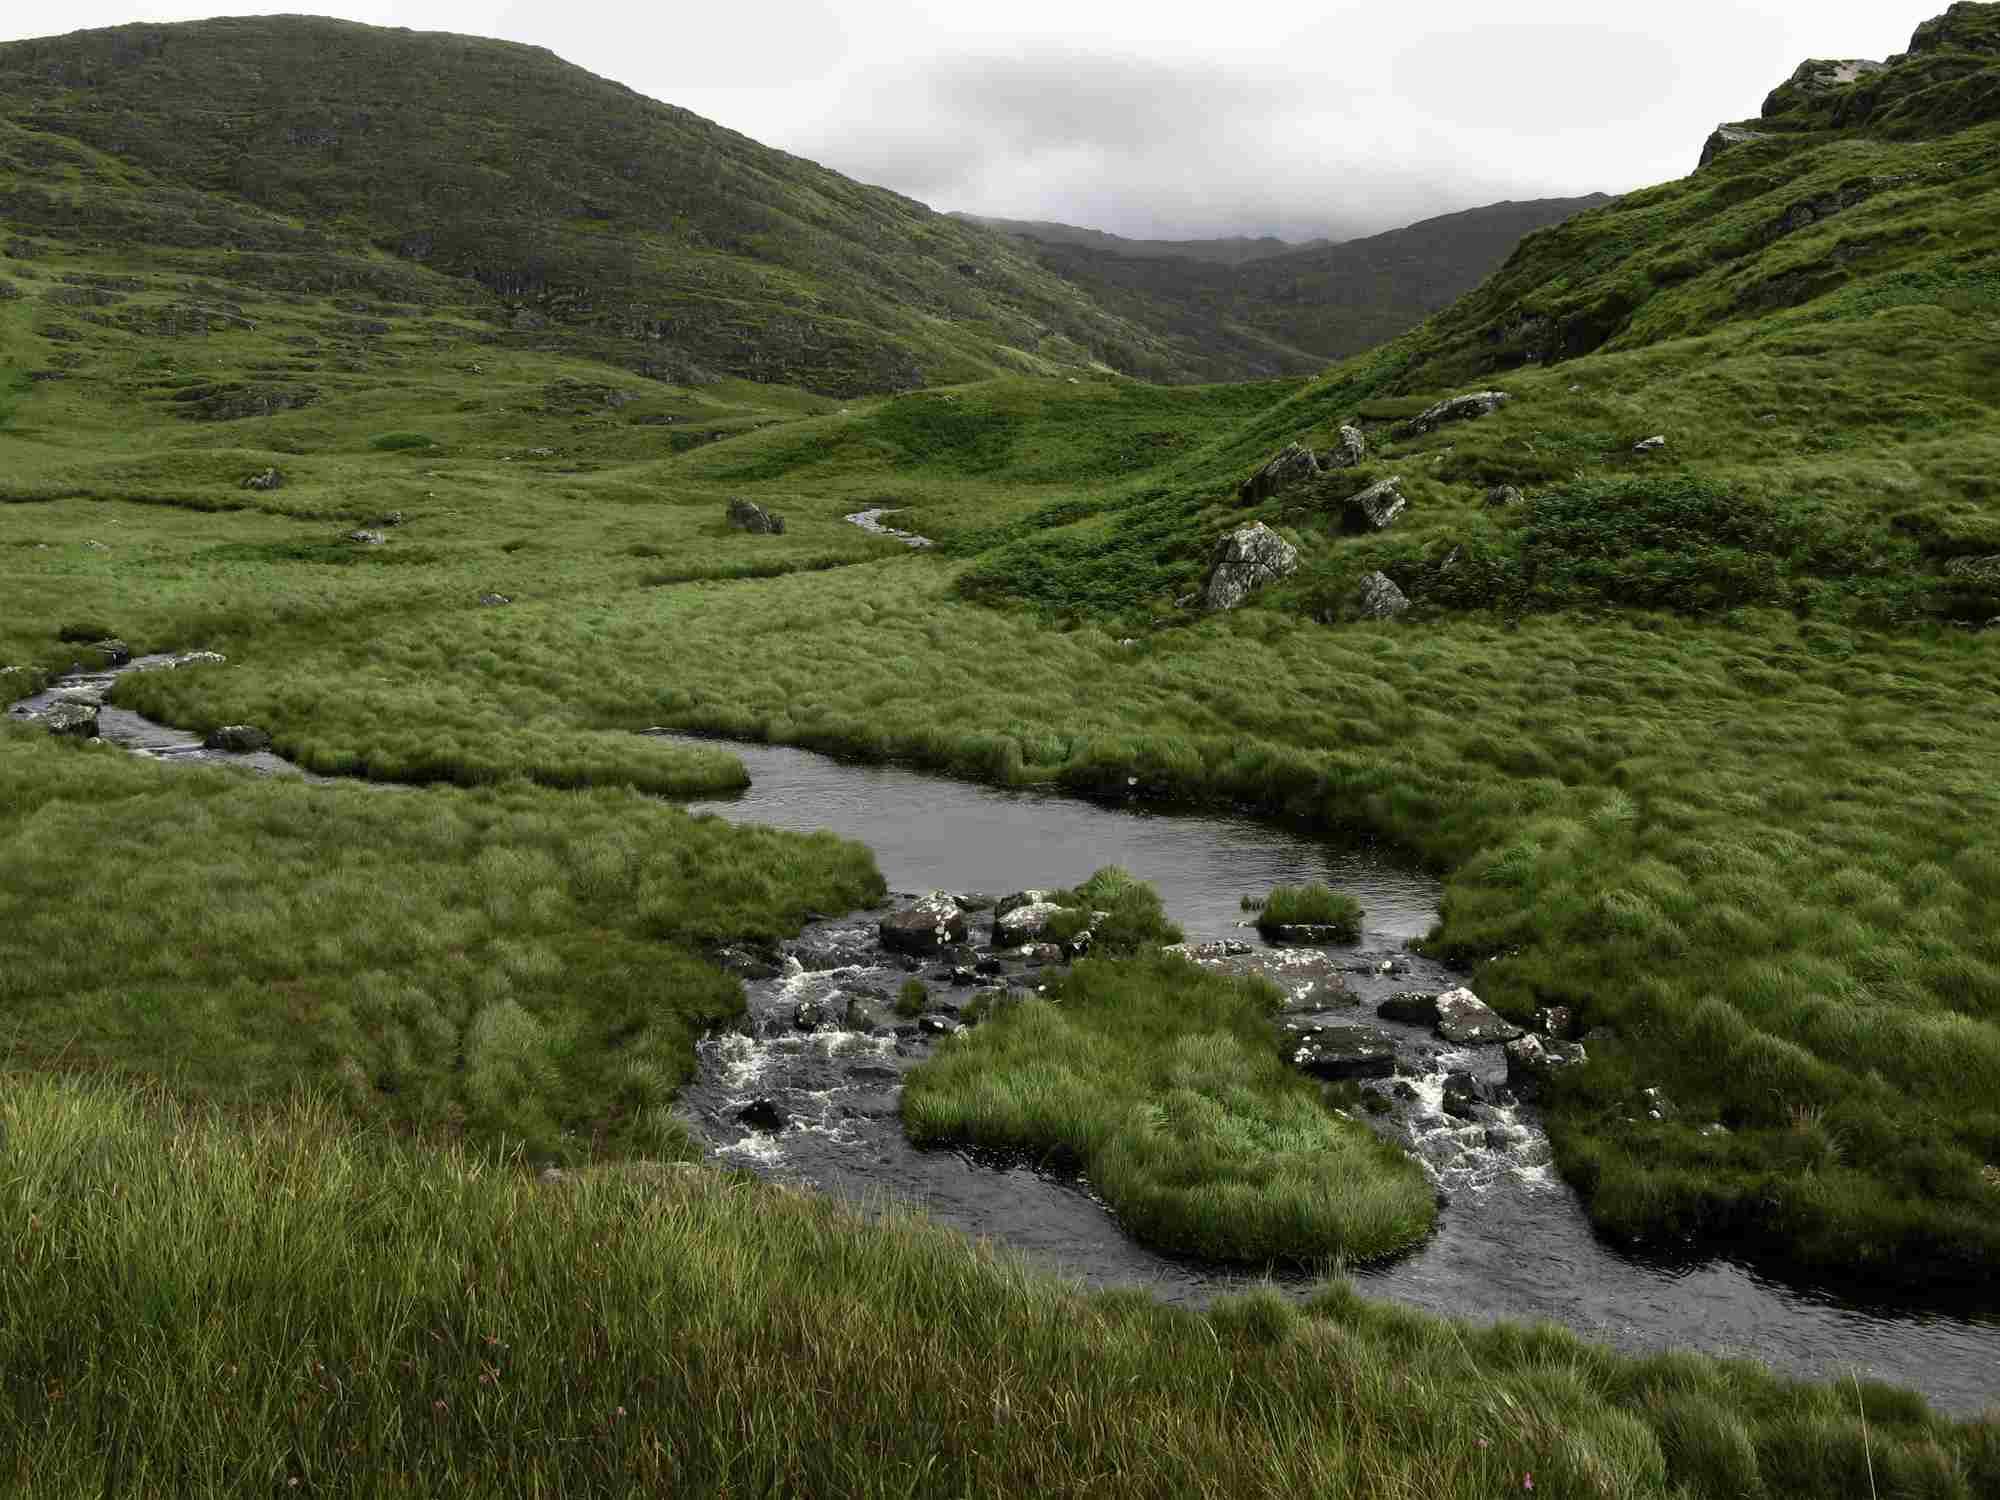 Ireland, Gleninchaquin Park on Beara Peninsula